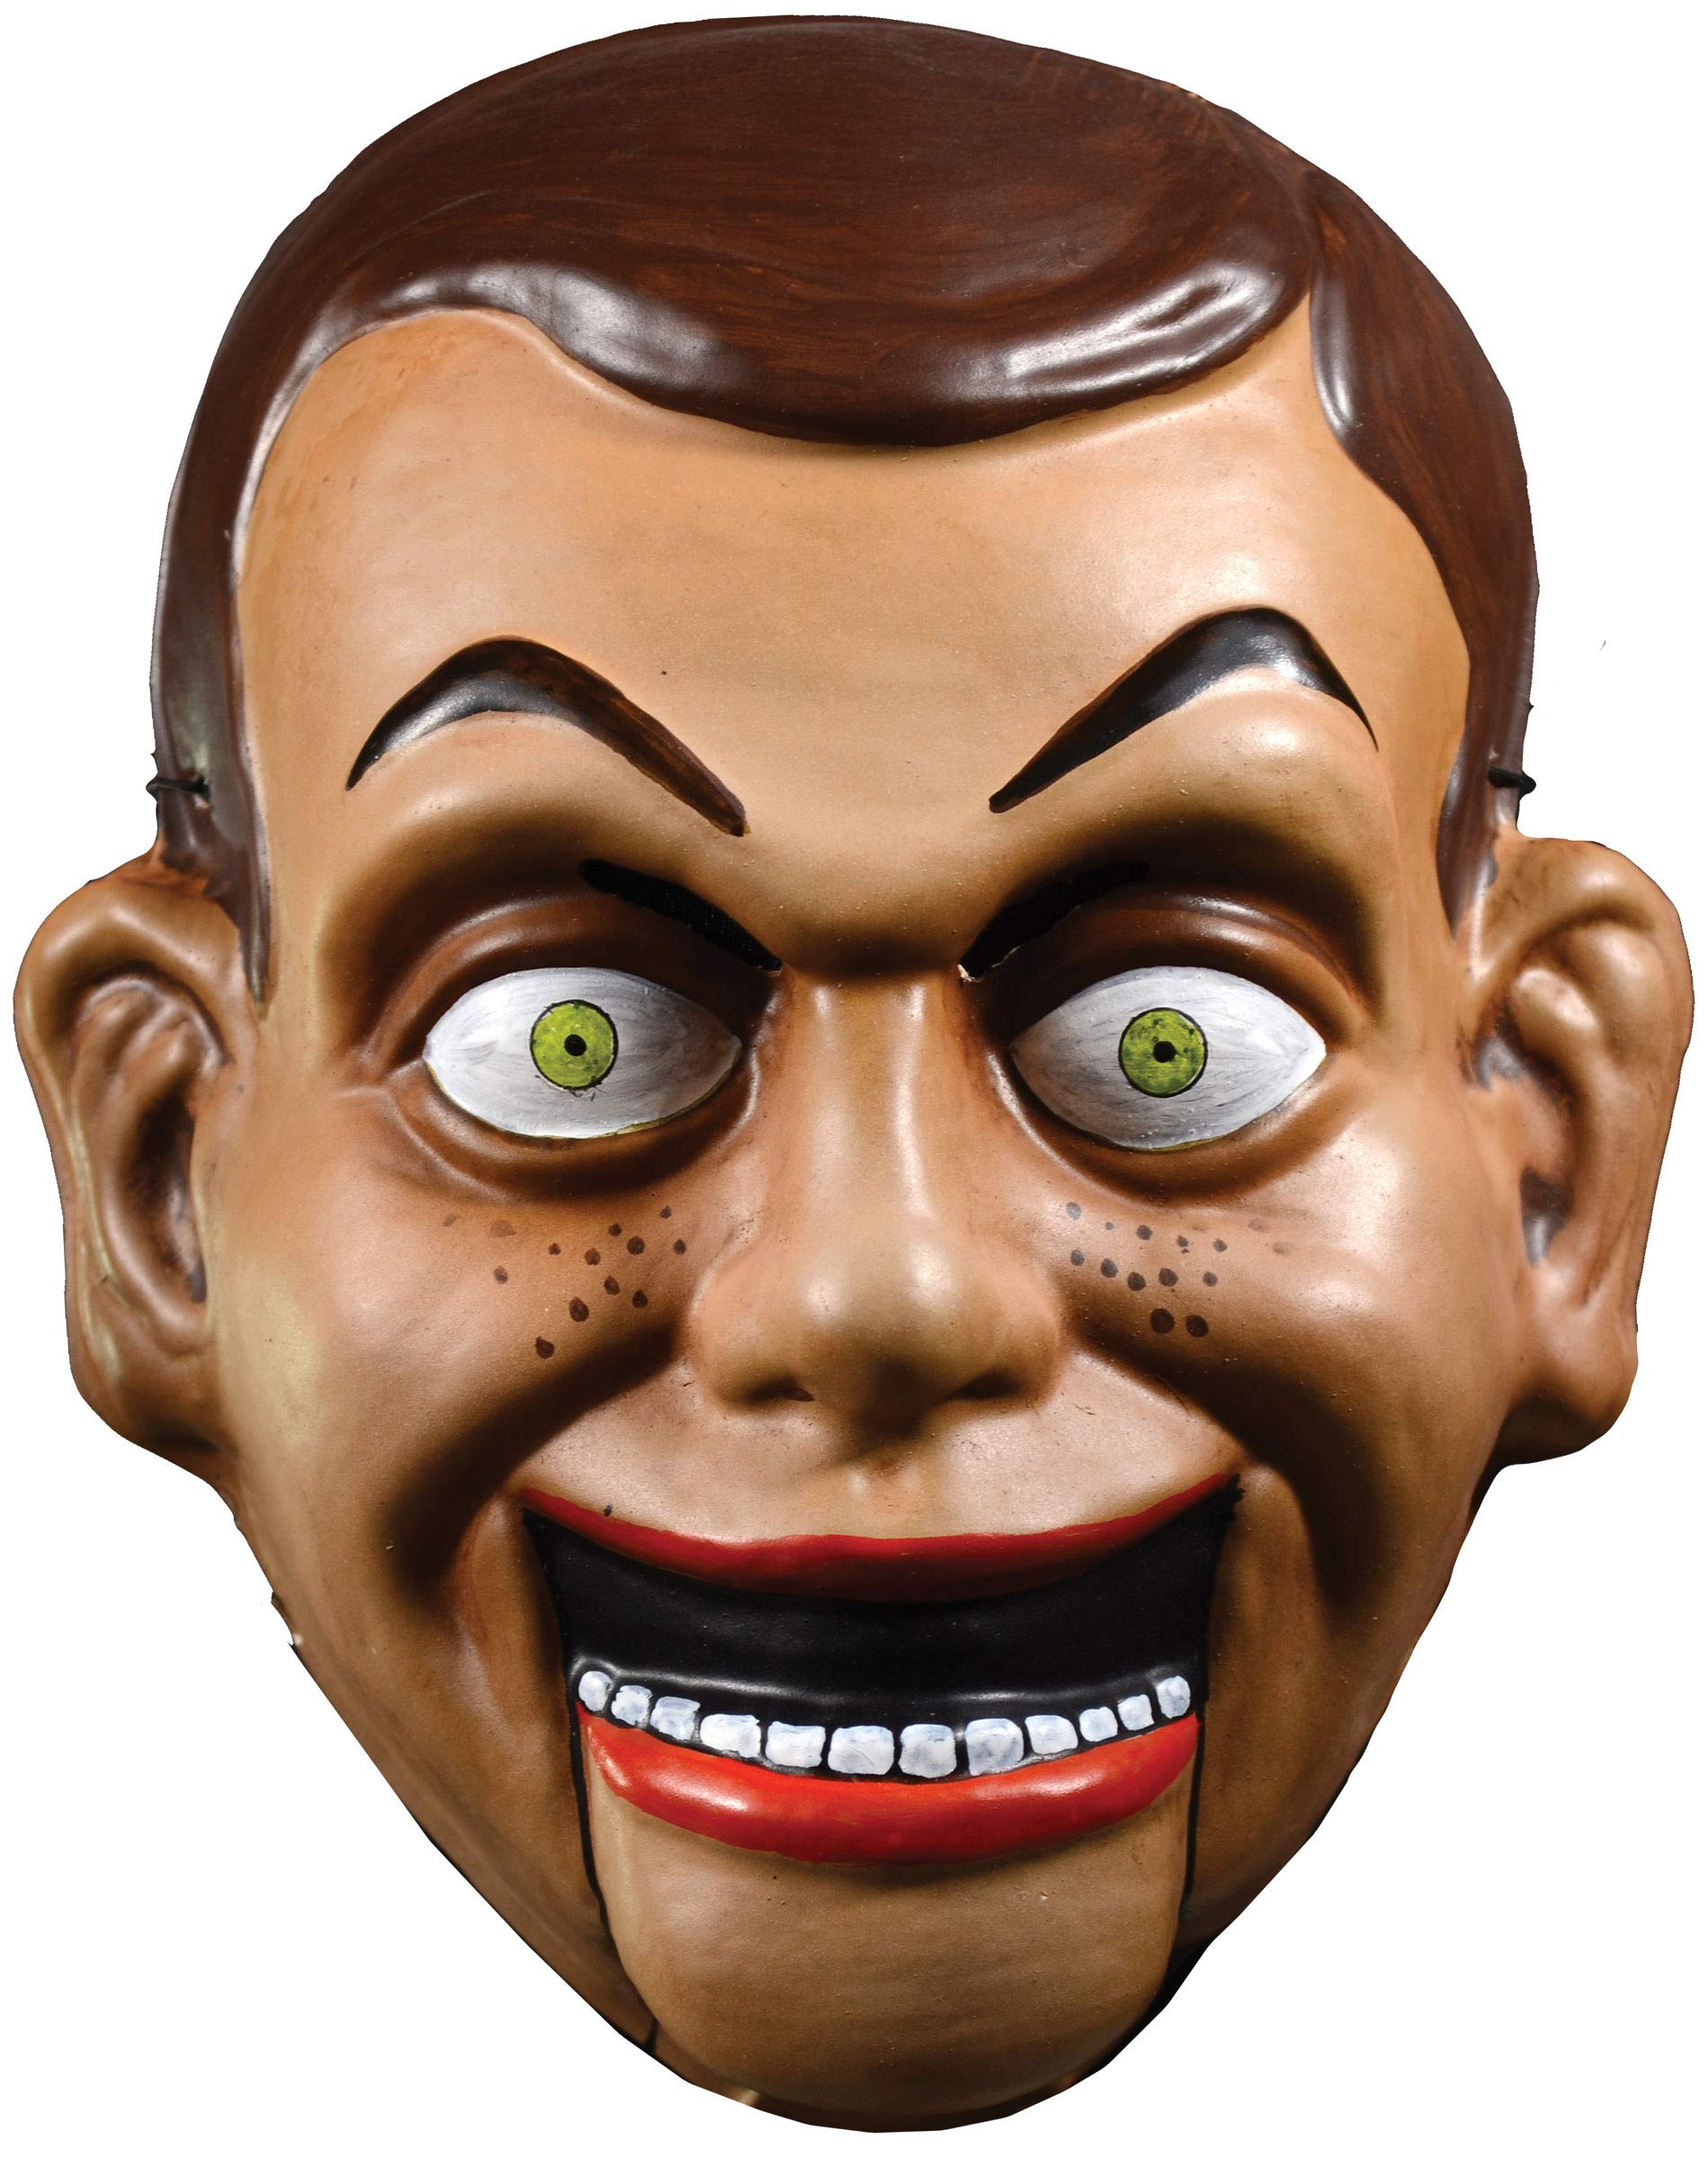 Spirit Halloween Slappy The Dummy Mask - Goosebumps